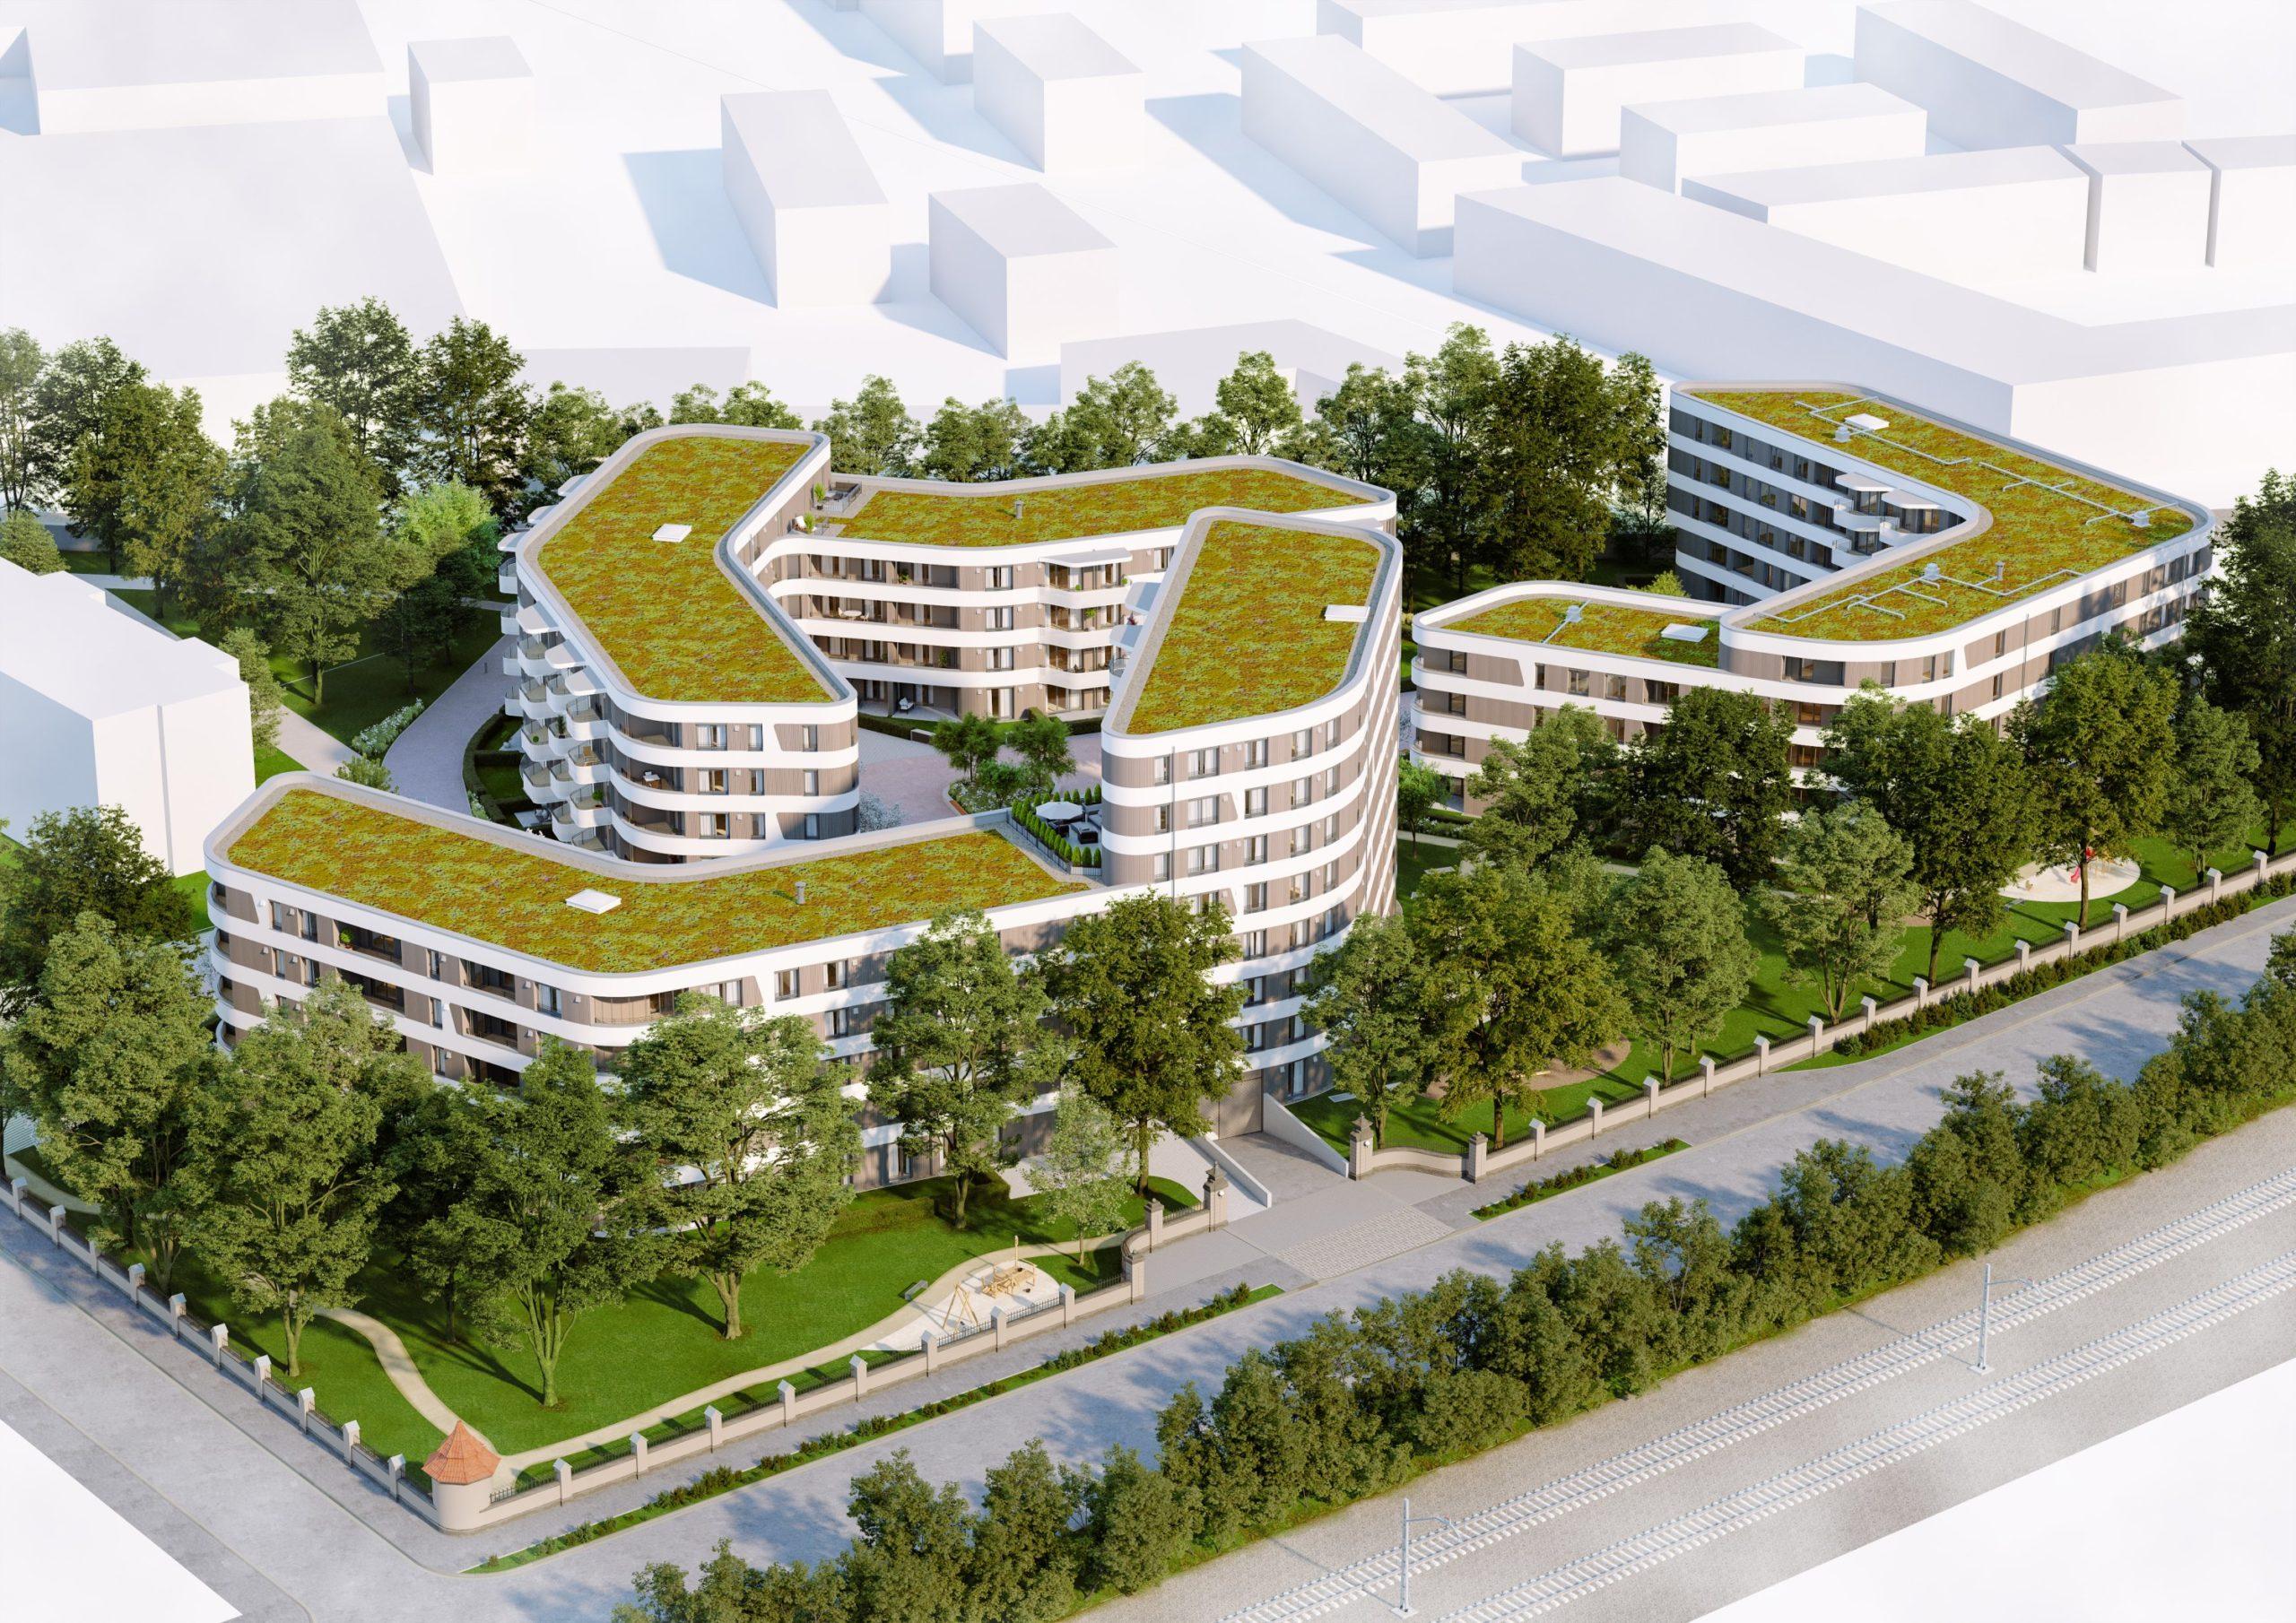 KLAUS Wohnbau GmbH: Wohnbauprojekt ANTON